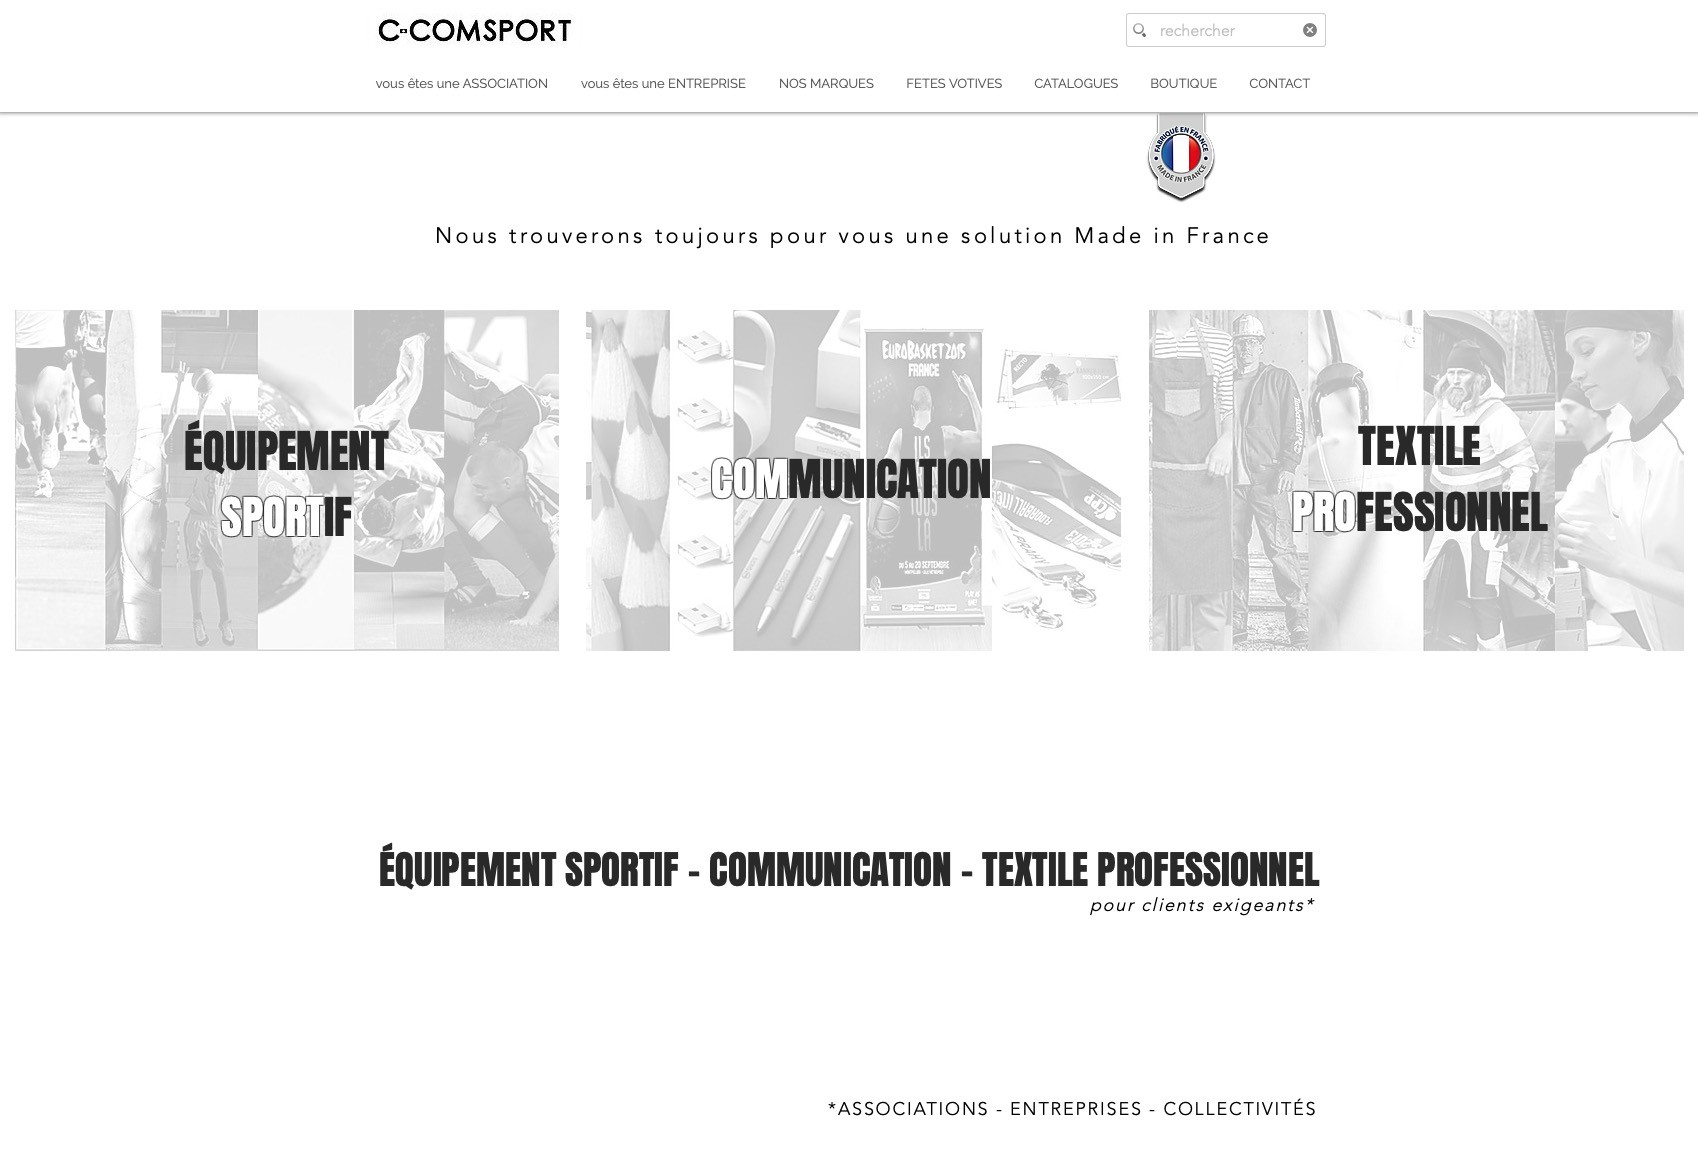 (c) C-comsport.fr